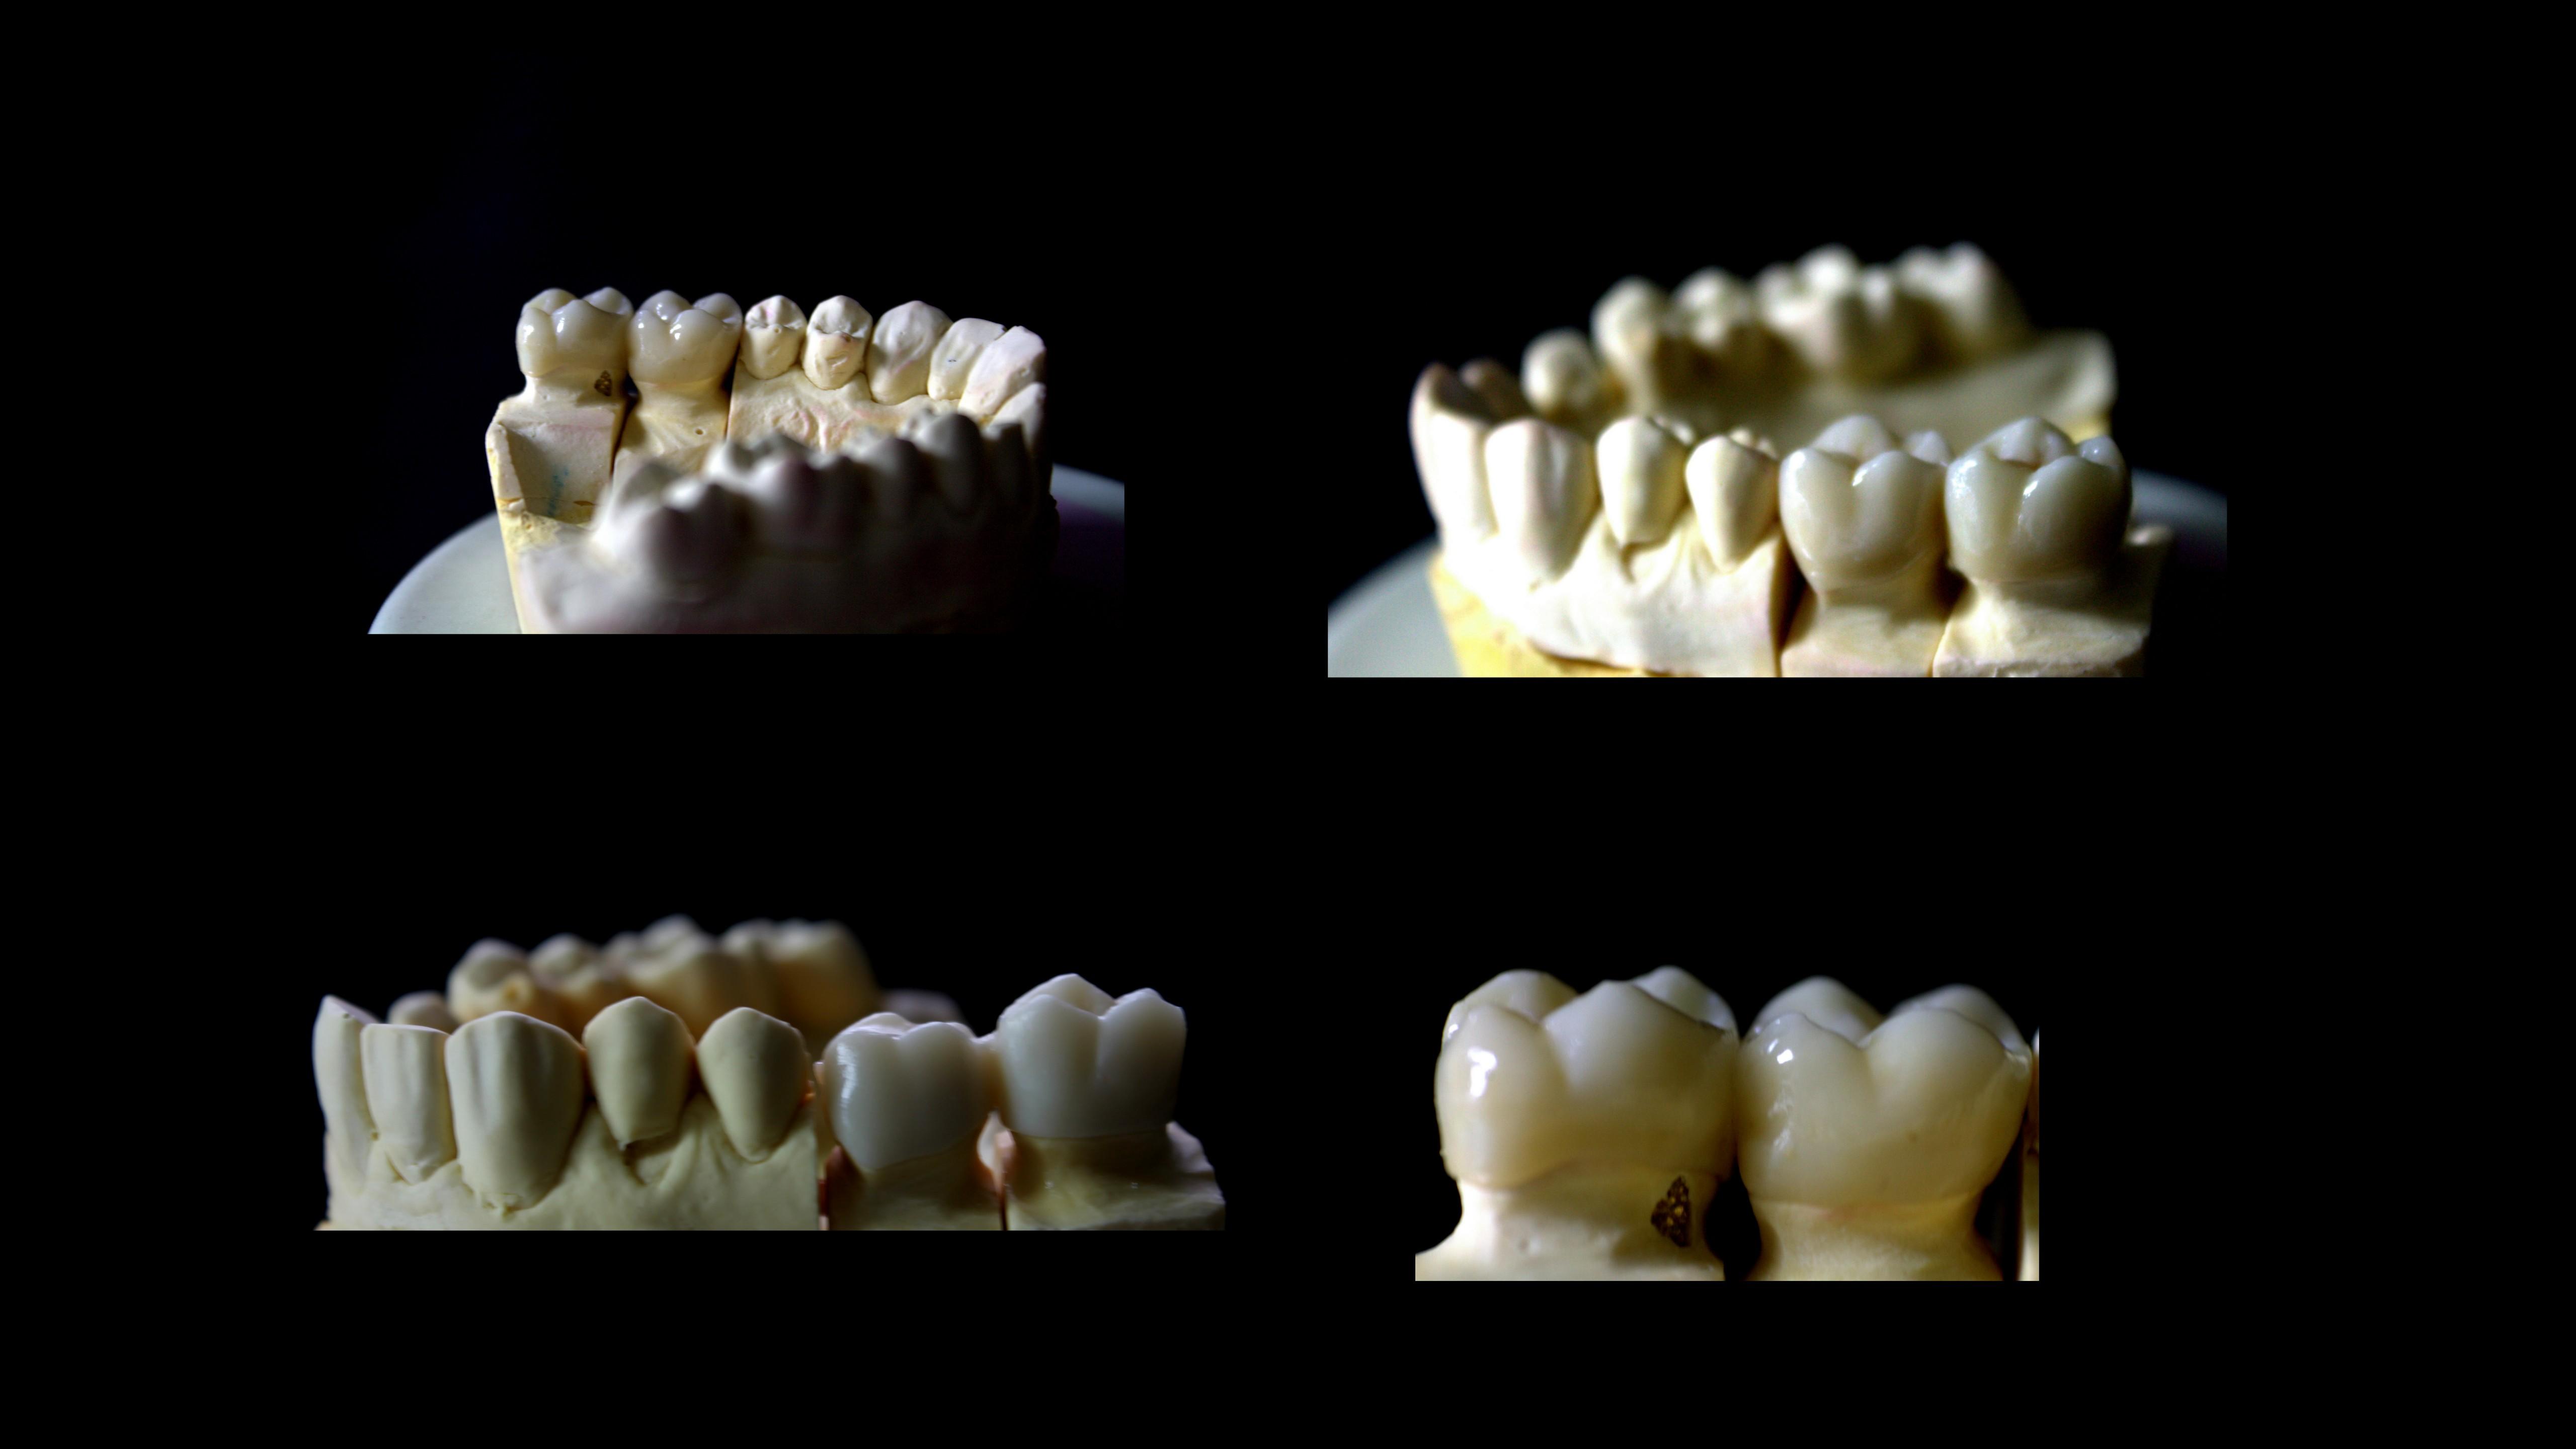 zir.οδοντοτεχνογνωσία ζιρκονιο